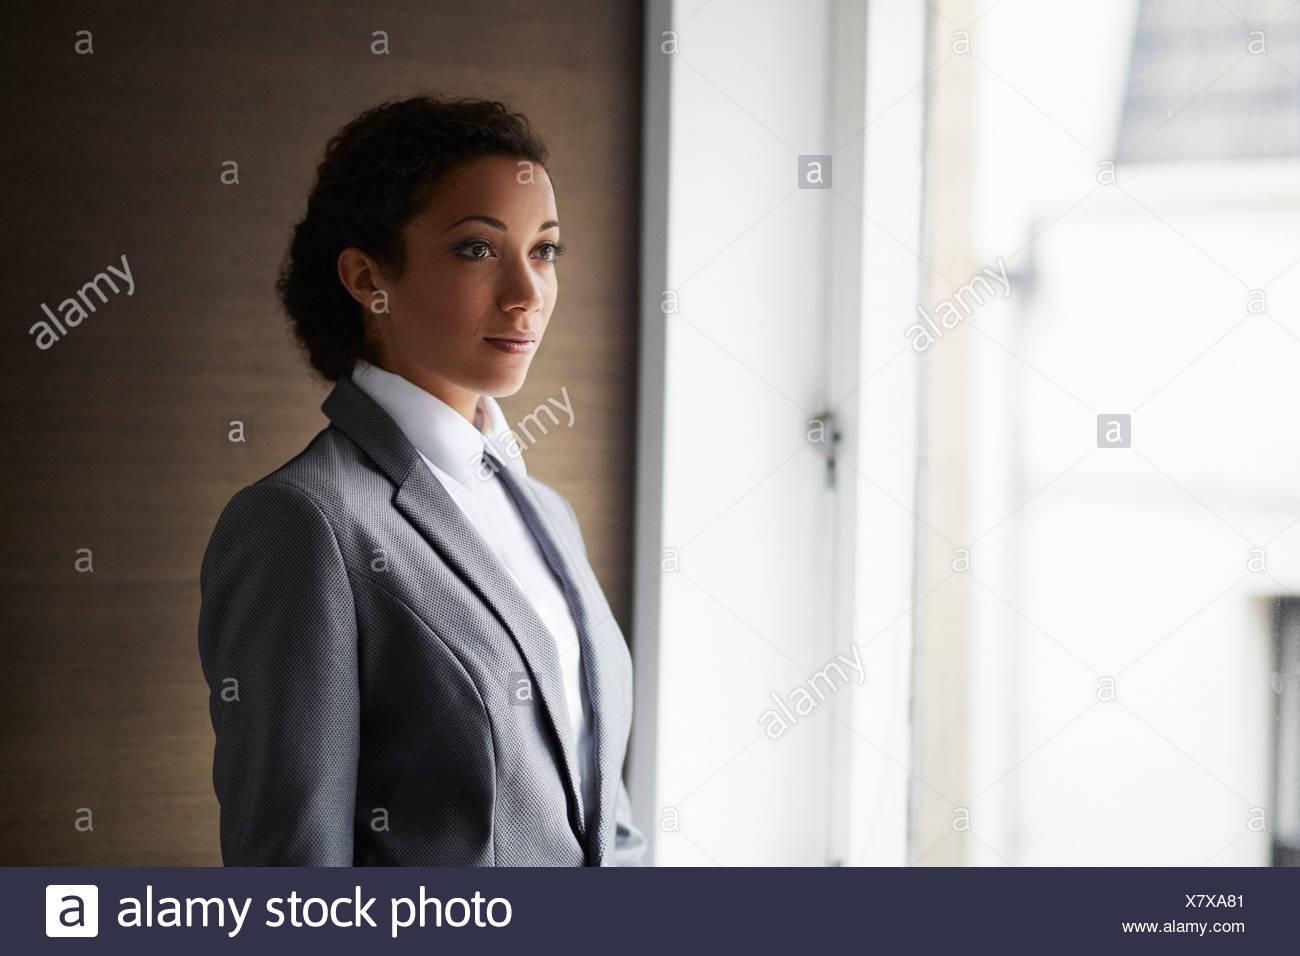 Portrait of businesswoman by window - Stock Image